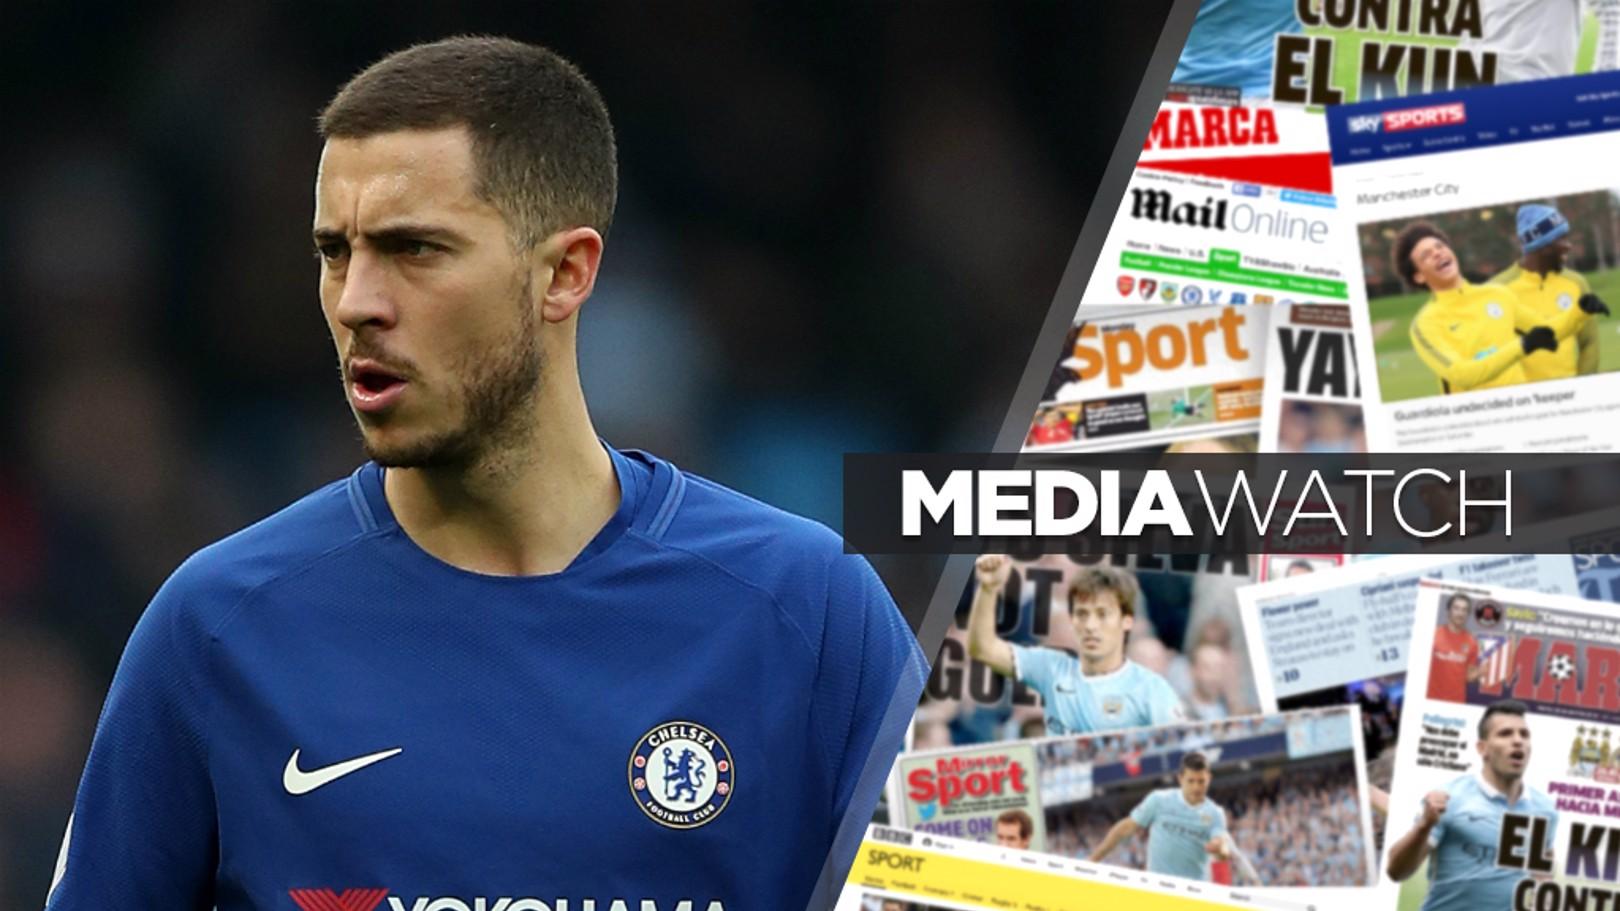 HAZARD AHEAD?: It's claimed City are eyeing a sensational £100million swoop for Eden Hazard...